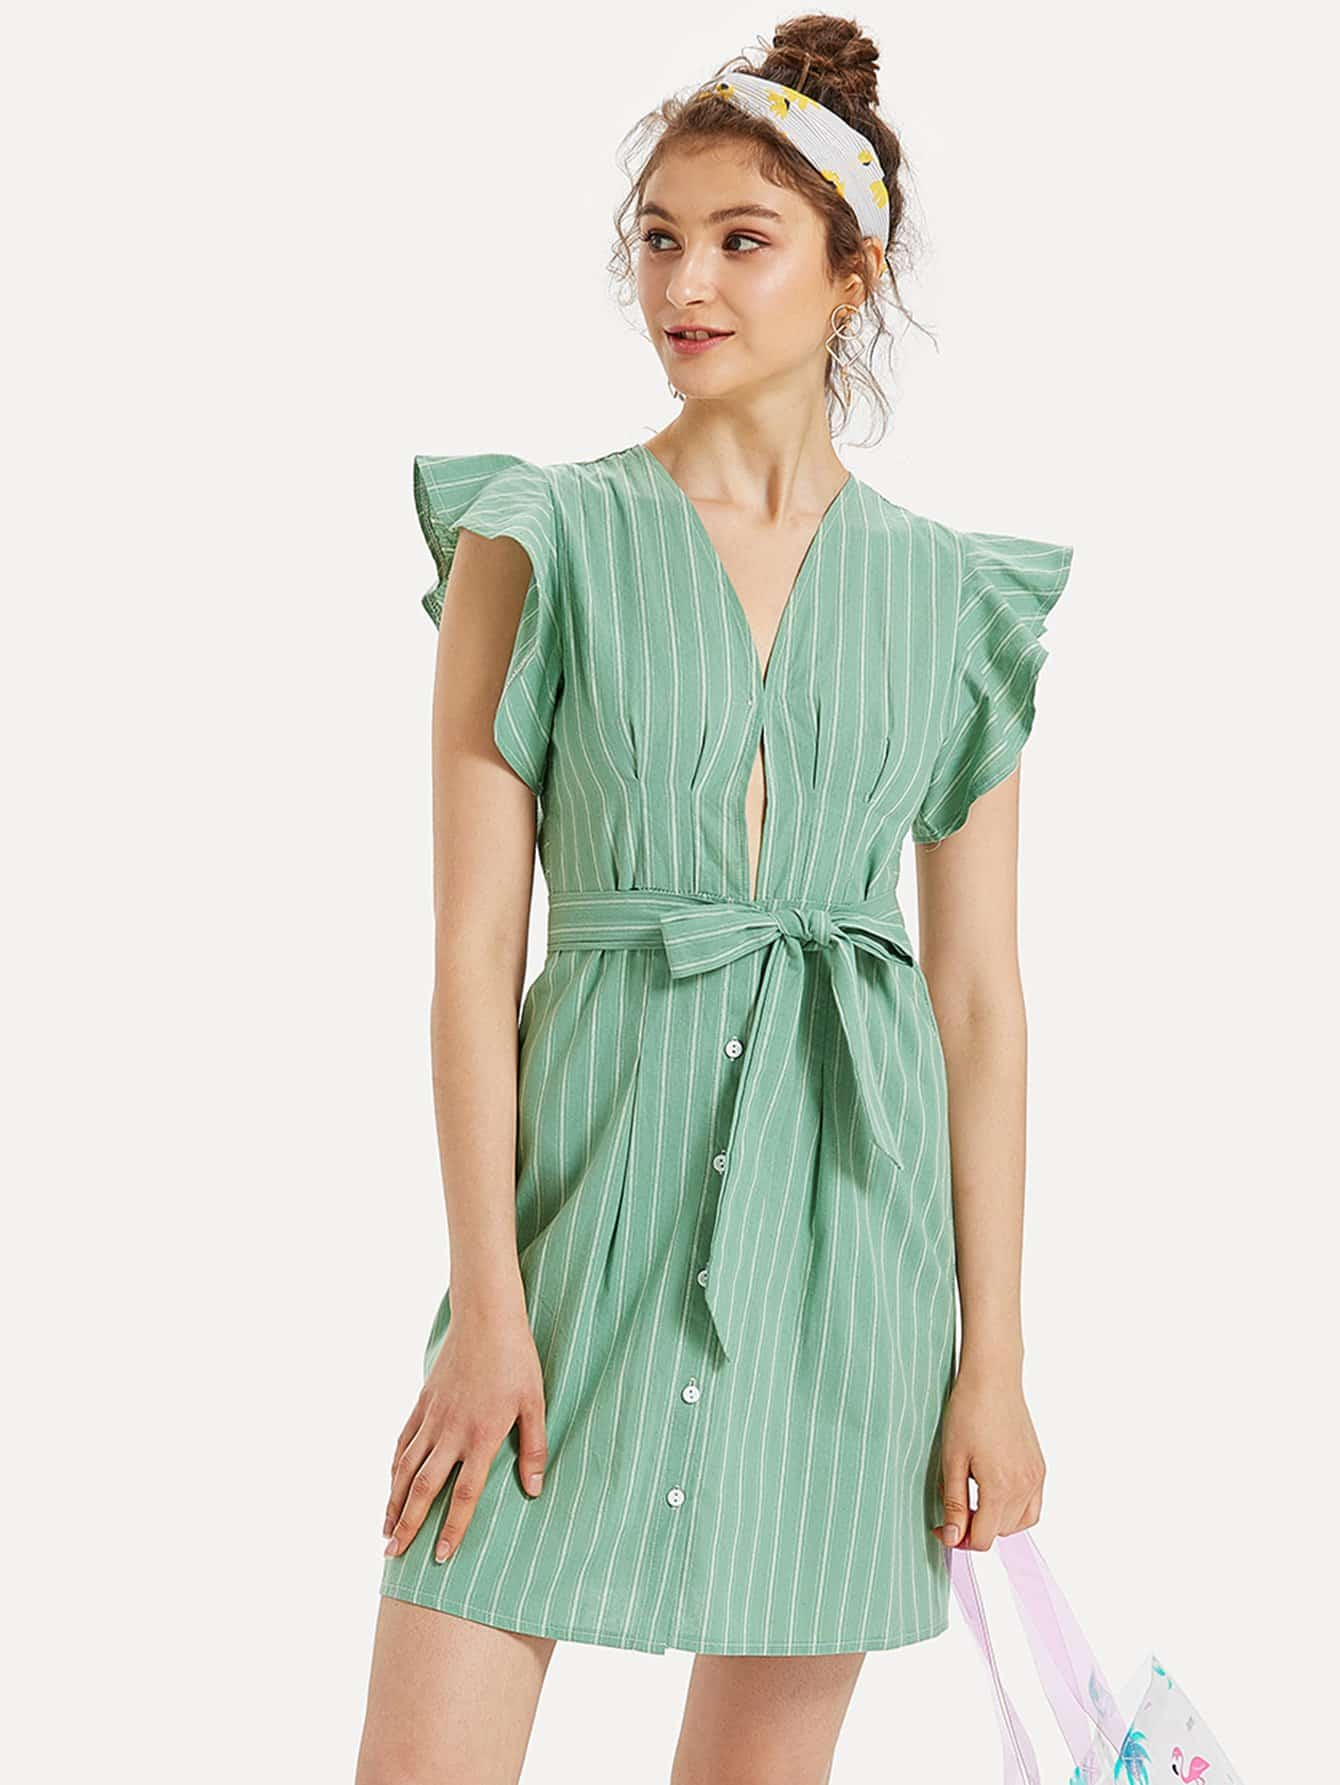 Self Tie Waist Vertical-Striped Dress striped ruffled waist self tie pants